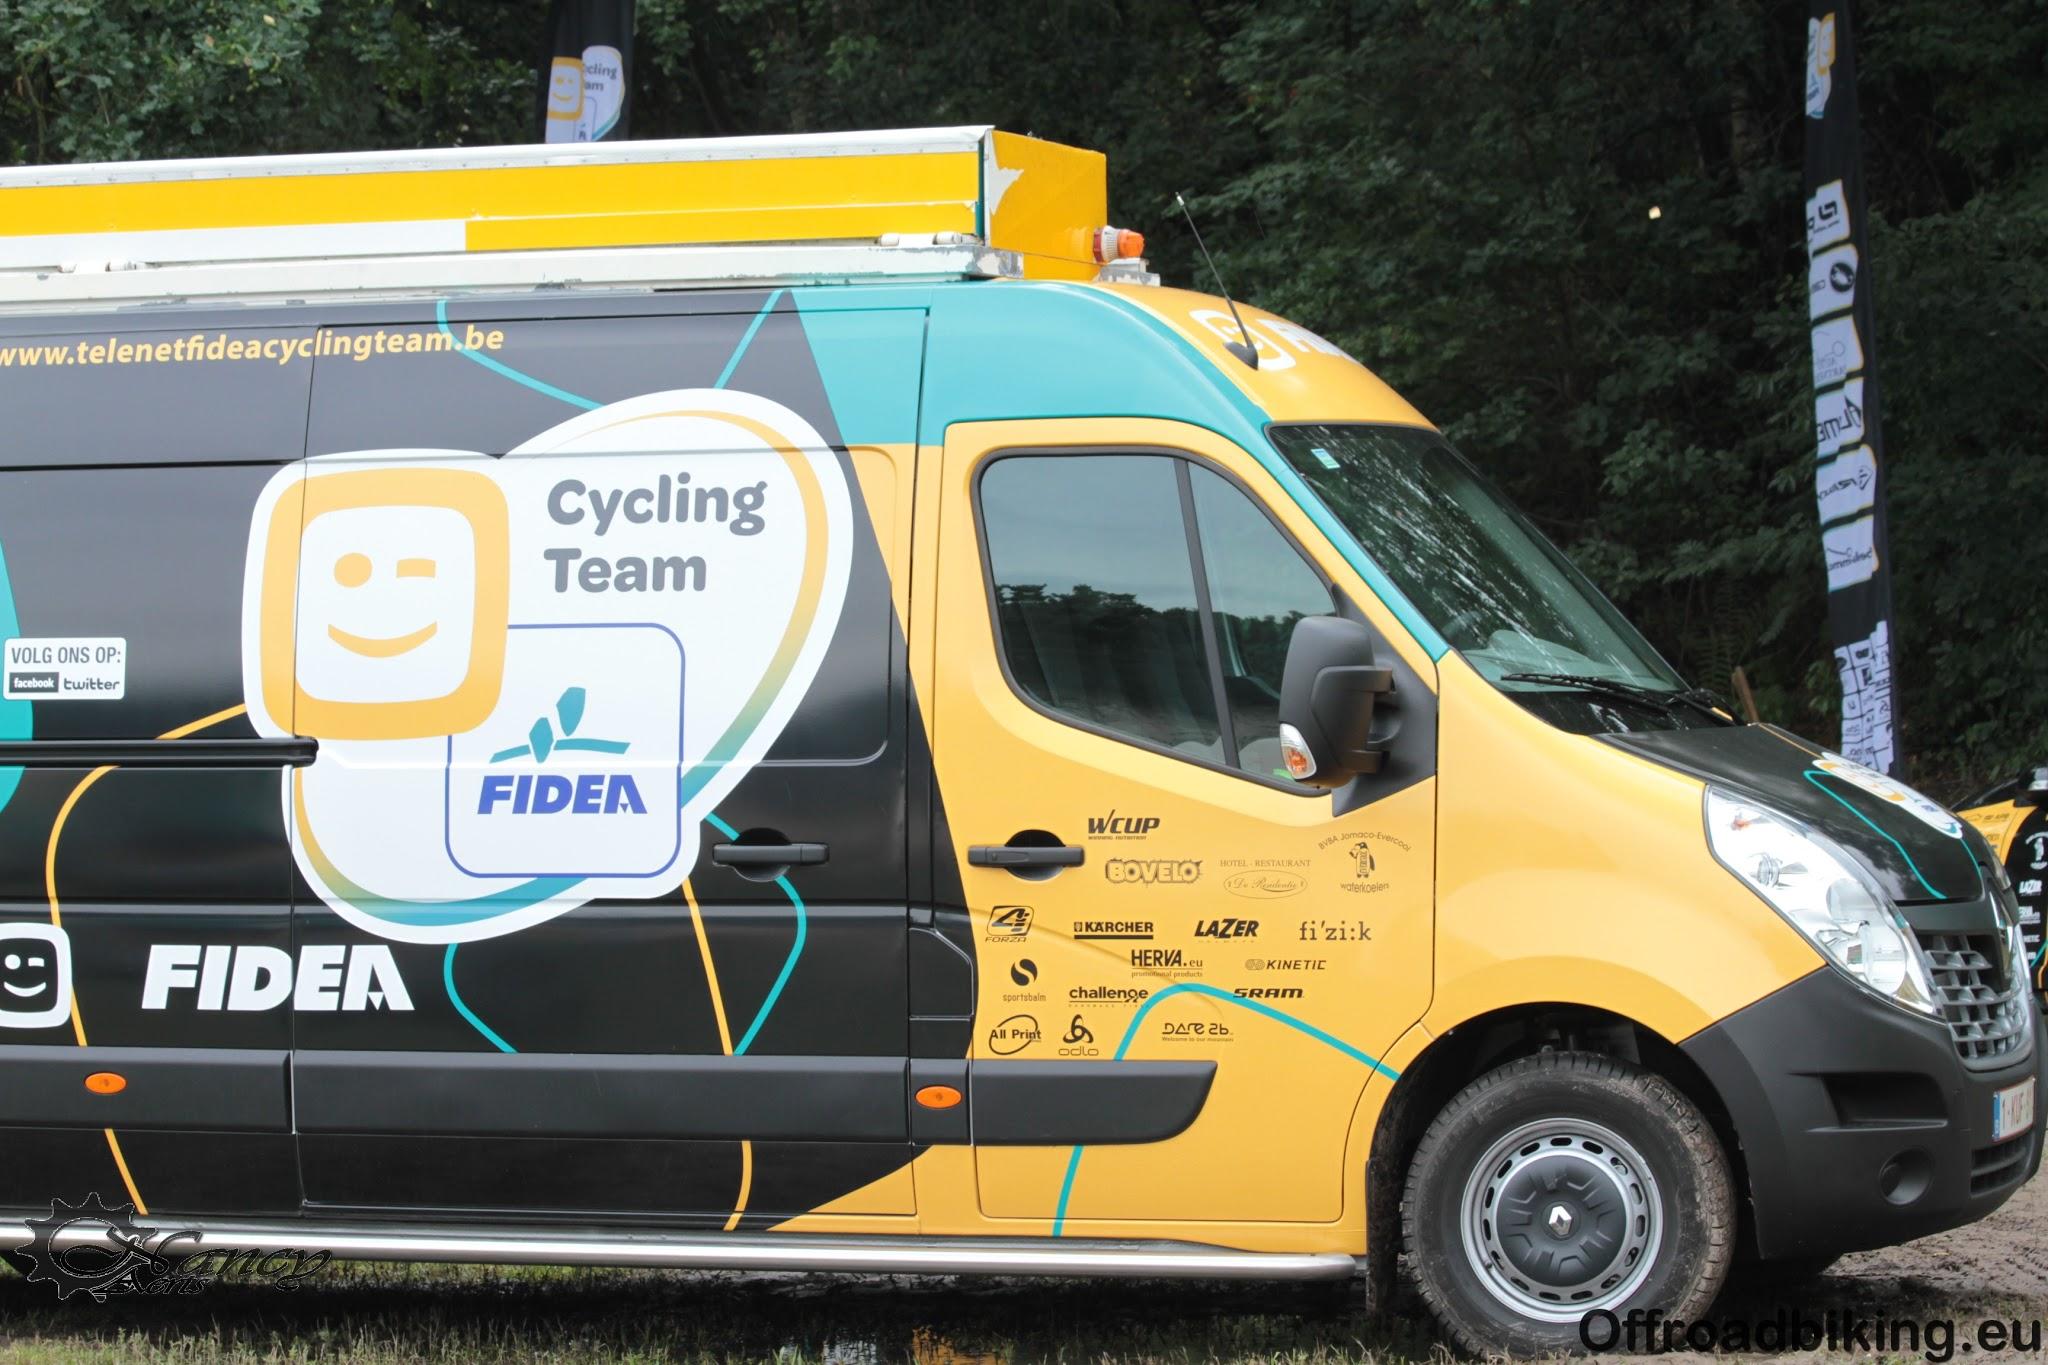 Telenet-Fidea Cycling Team afgereisd naar Amerika